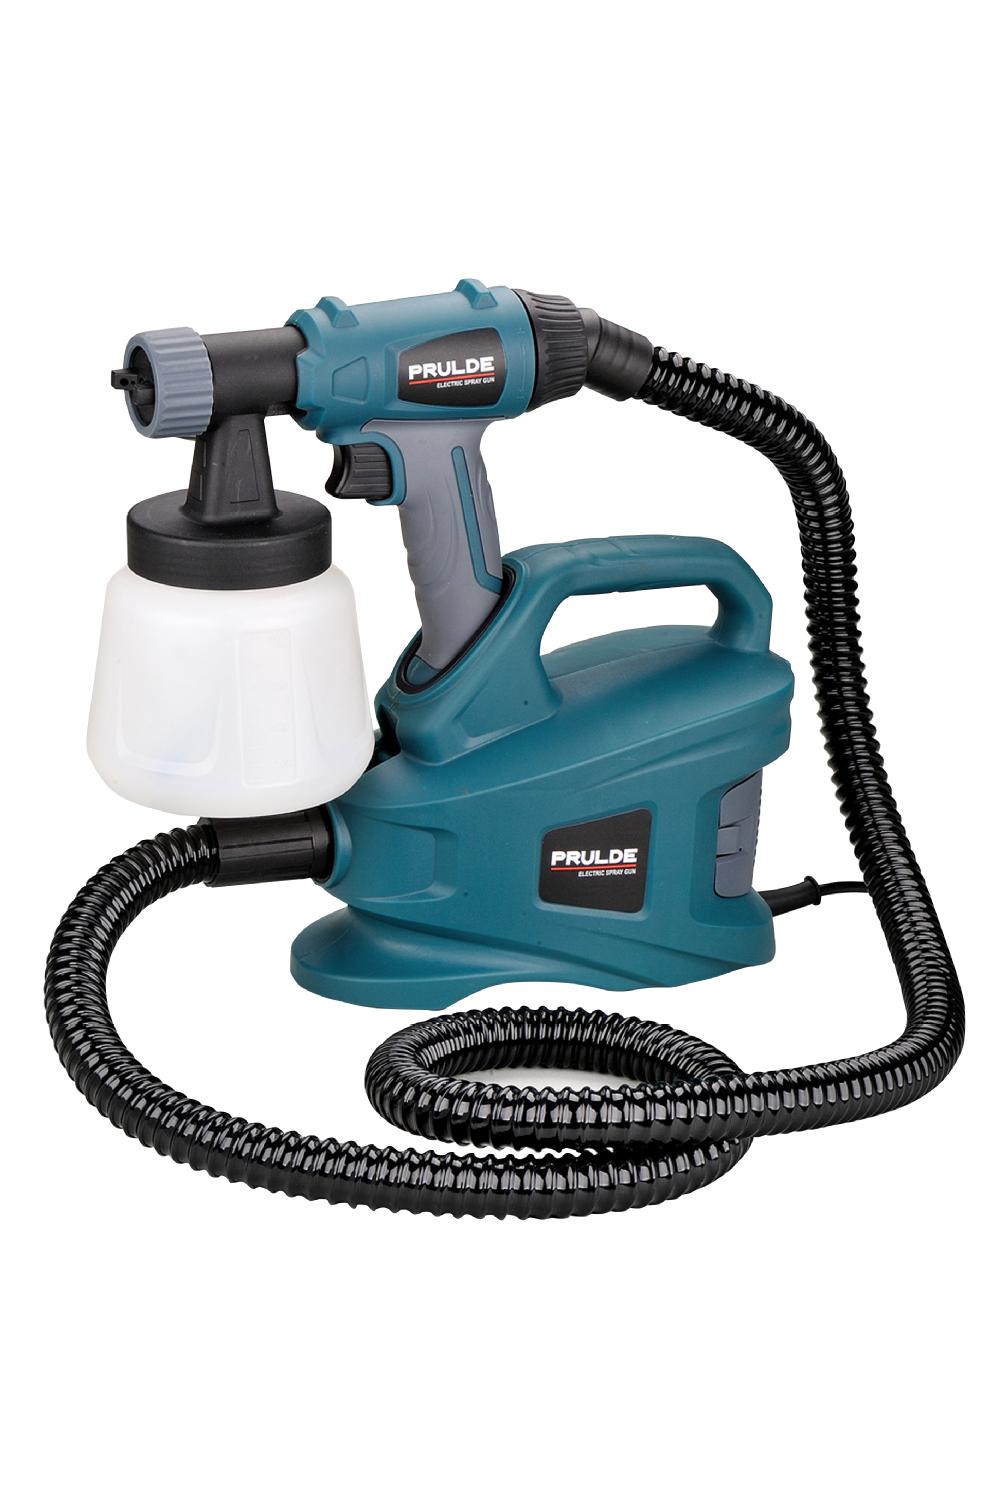 Prulde Pld3040b Electric Paint Spray Gun Buy Electric